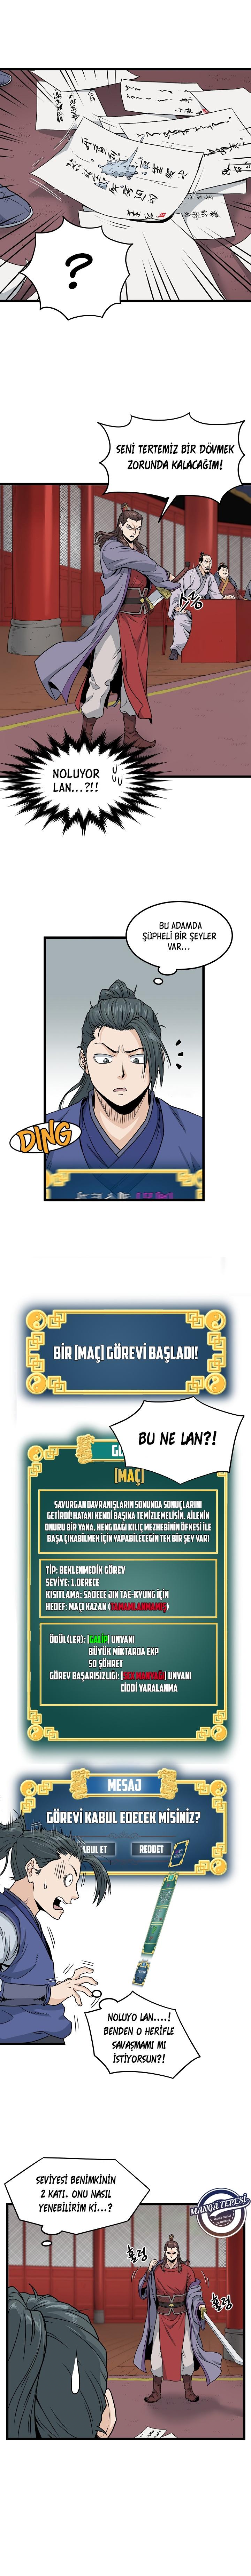 murim-loginbolum-13